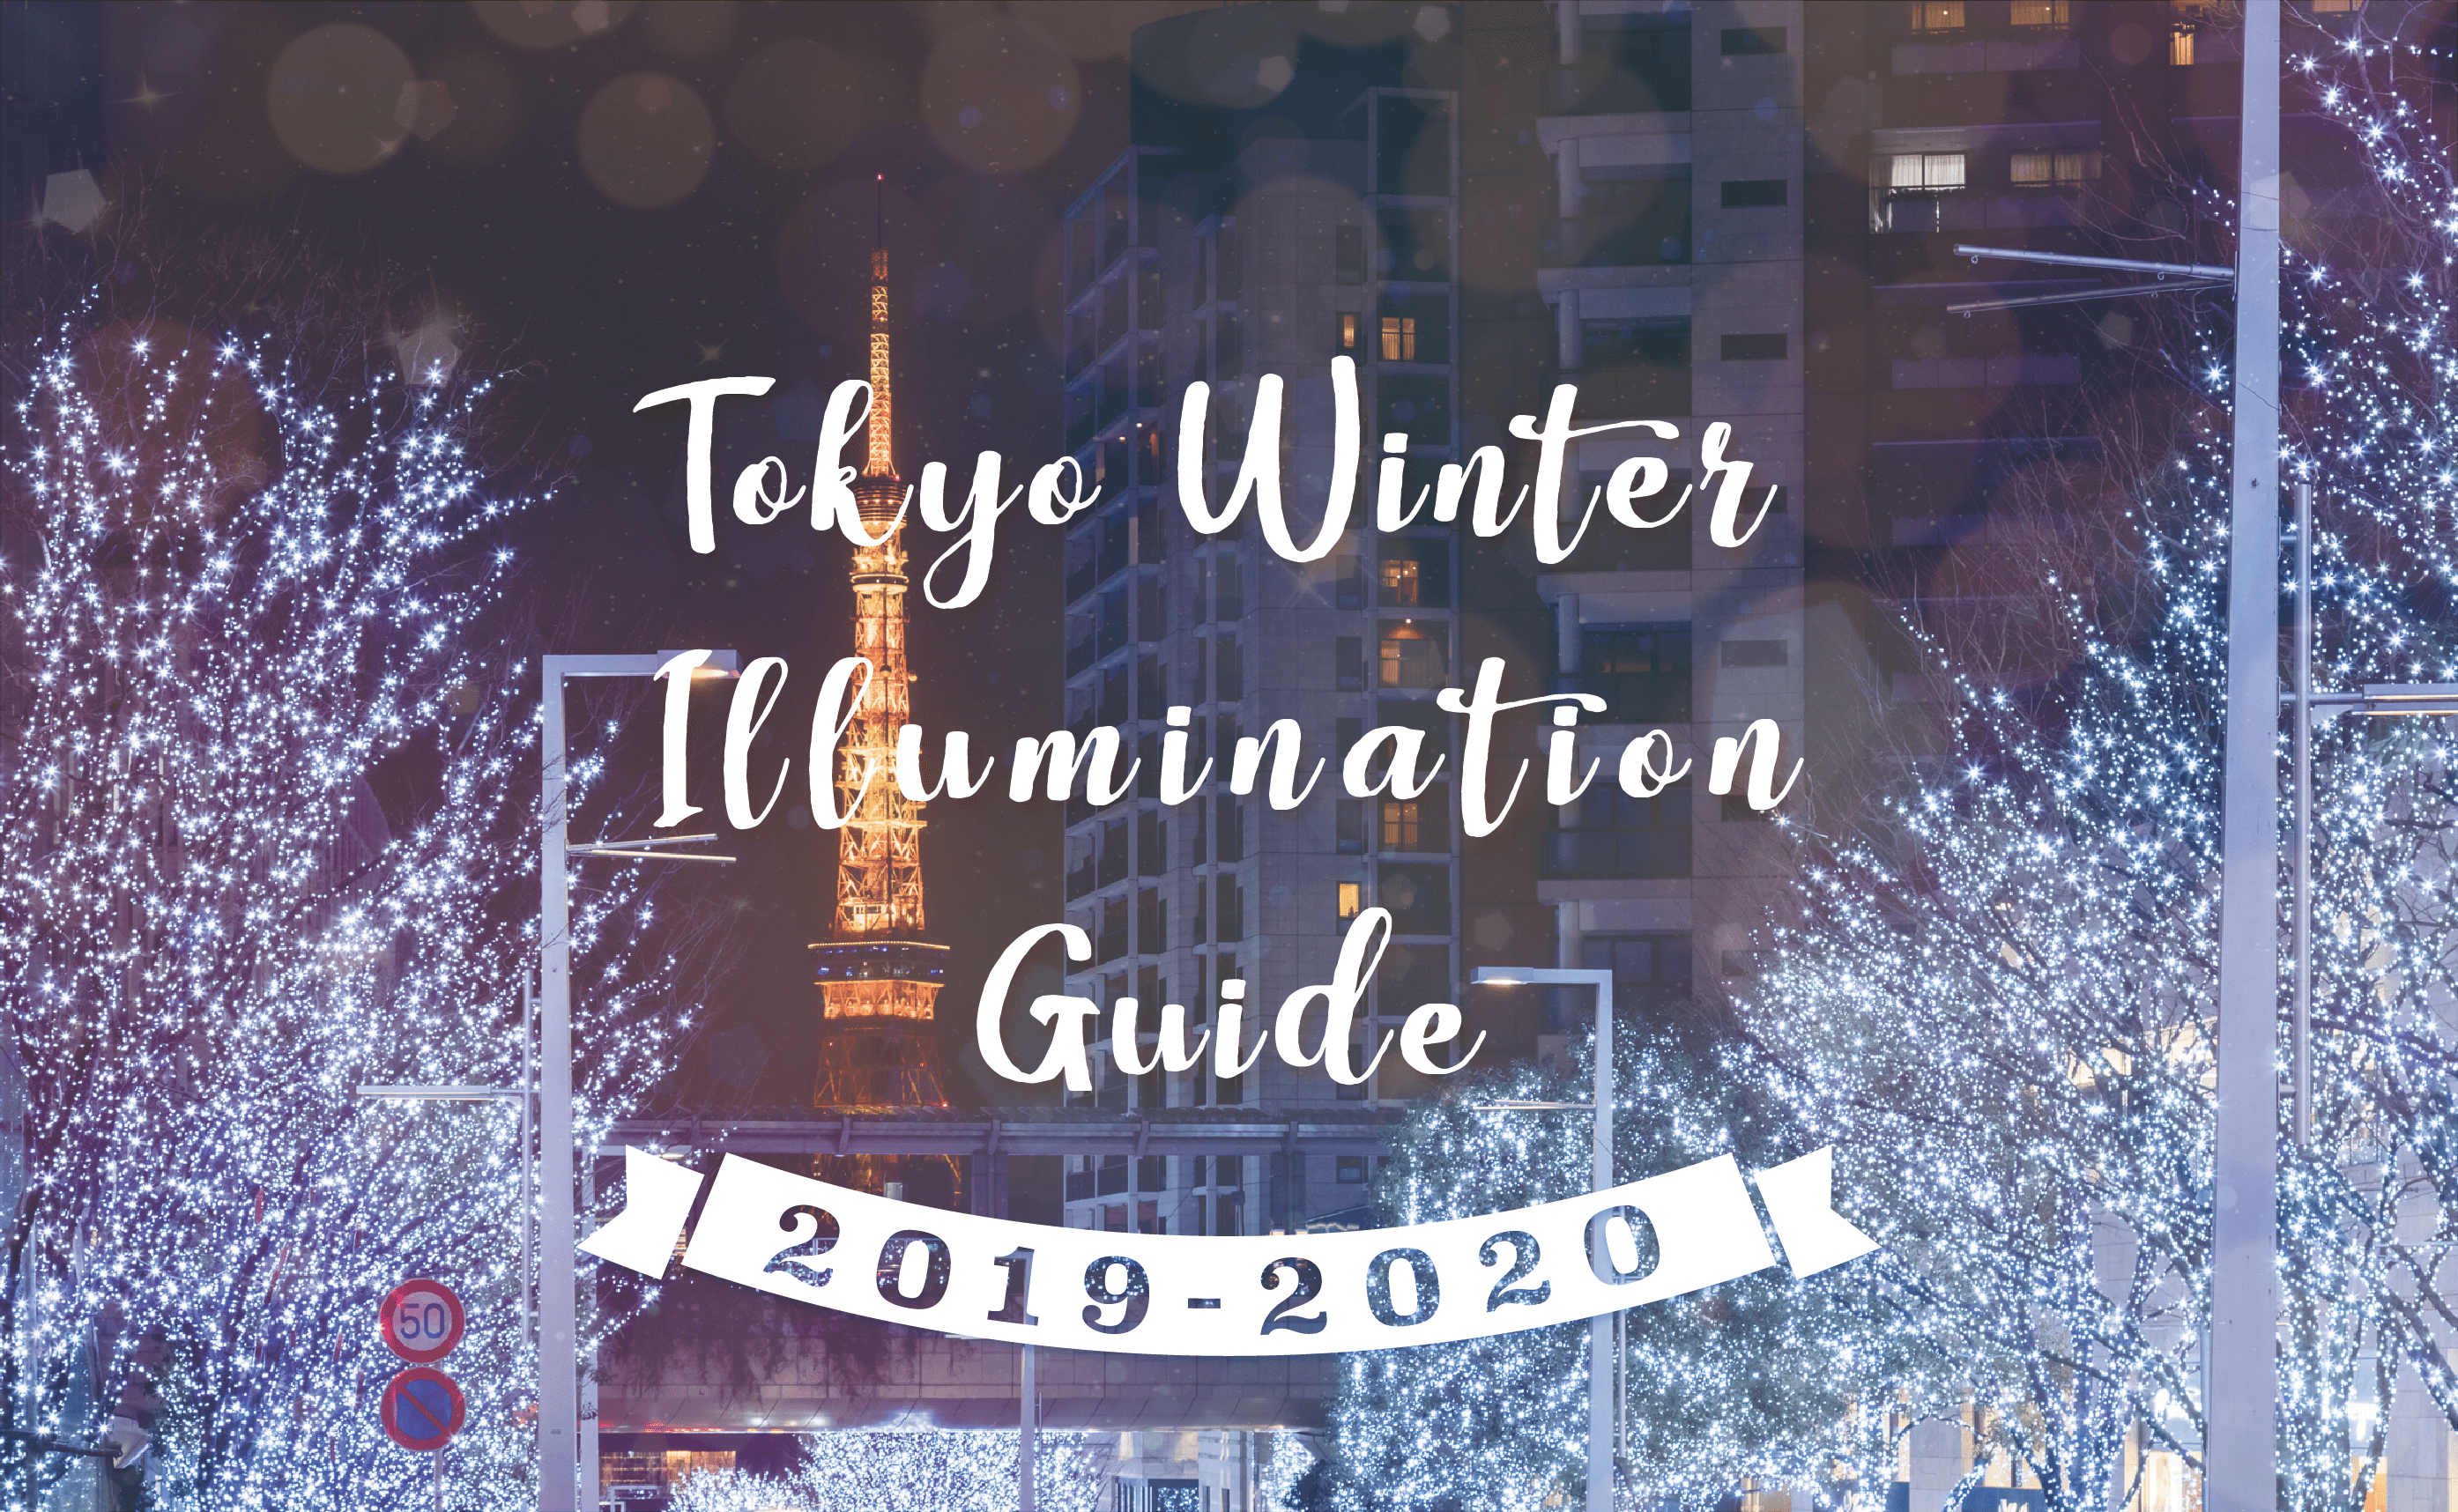 Best Winter Illuminations in Tokyo